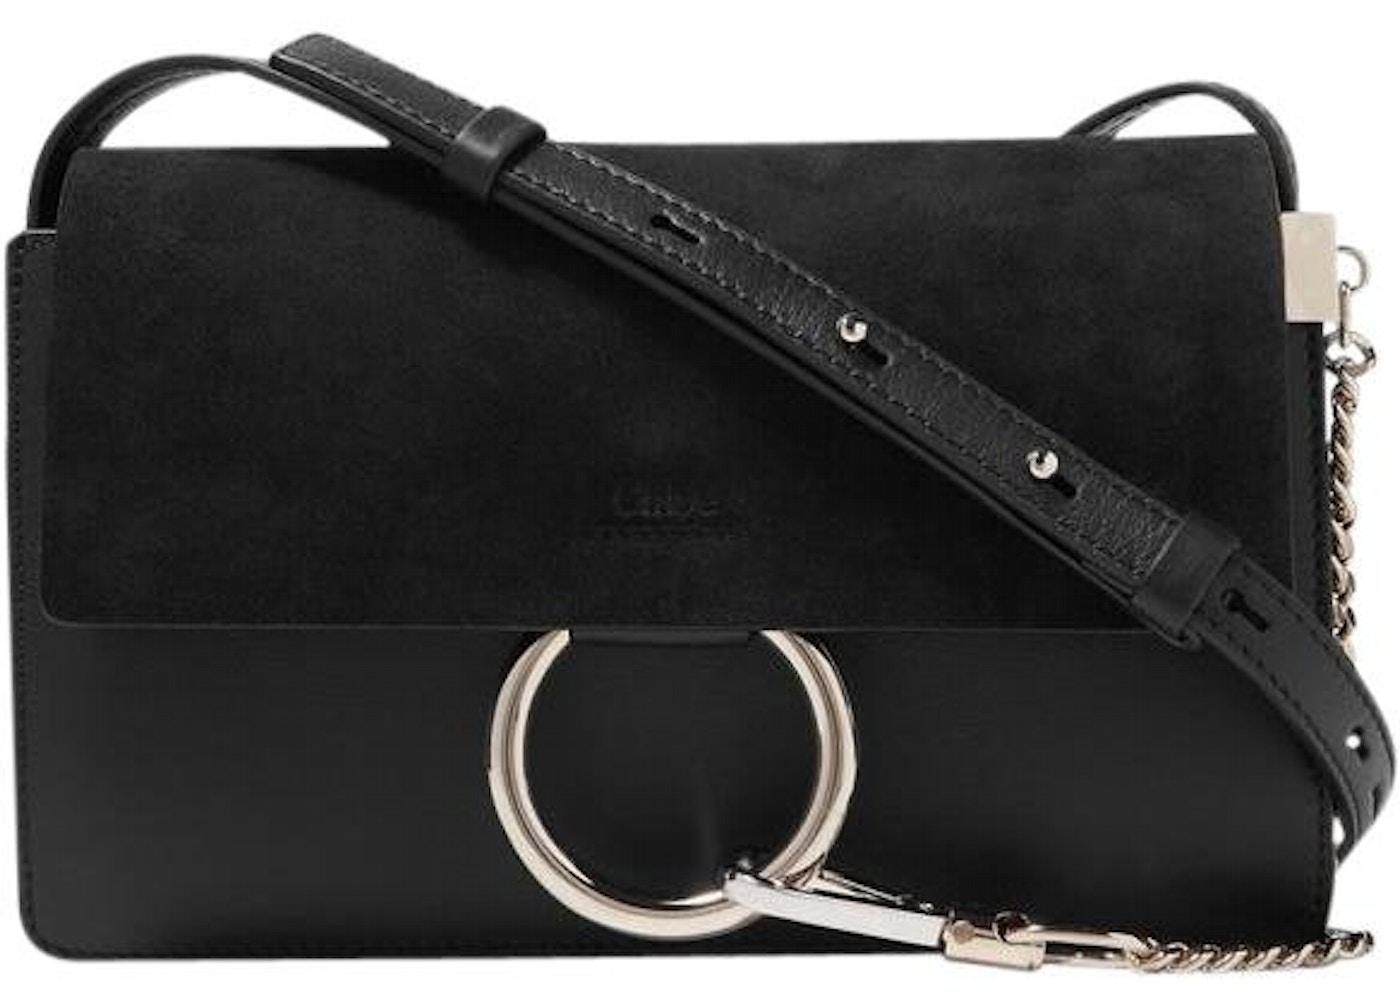 658868fae6 Chloe Faye Shoulder Bag Small Black